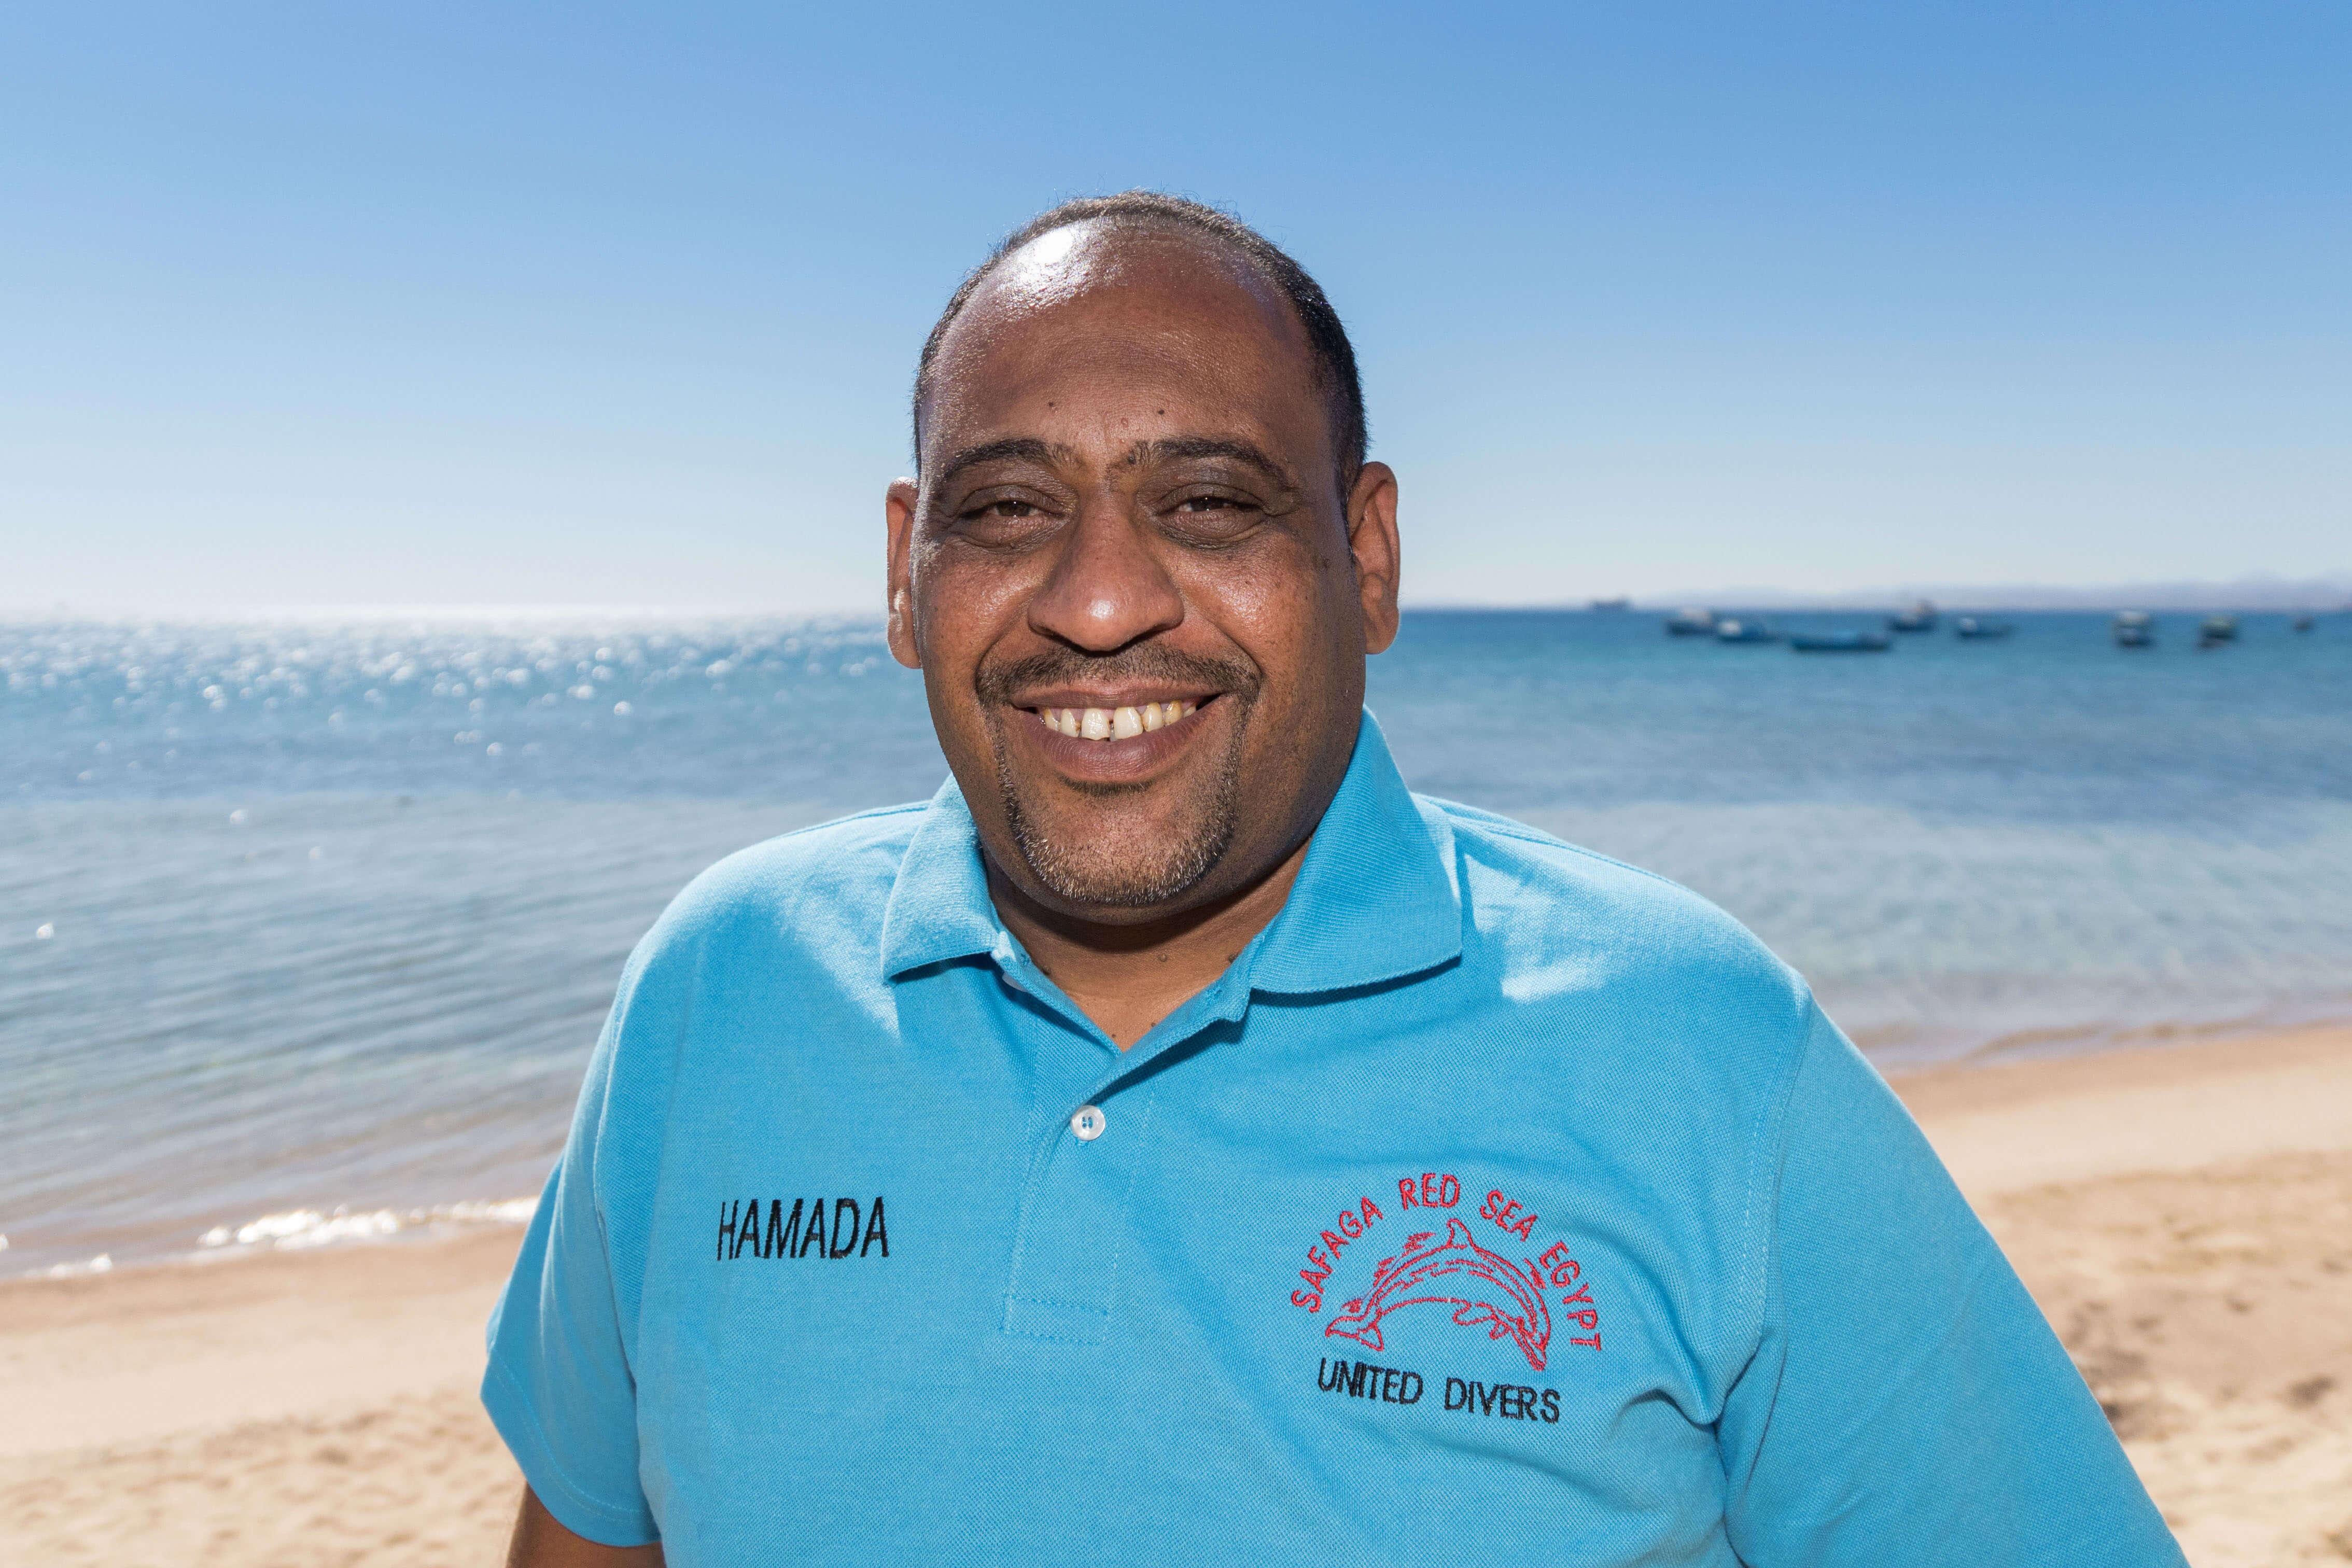 Hamada Responsable de United Divers Egypt Safaga